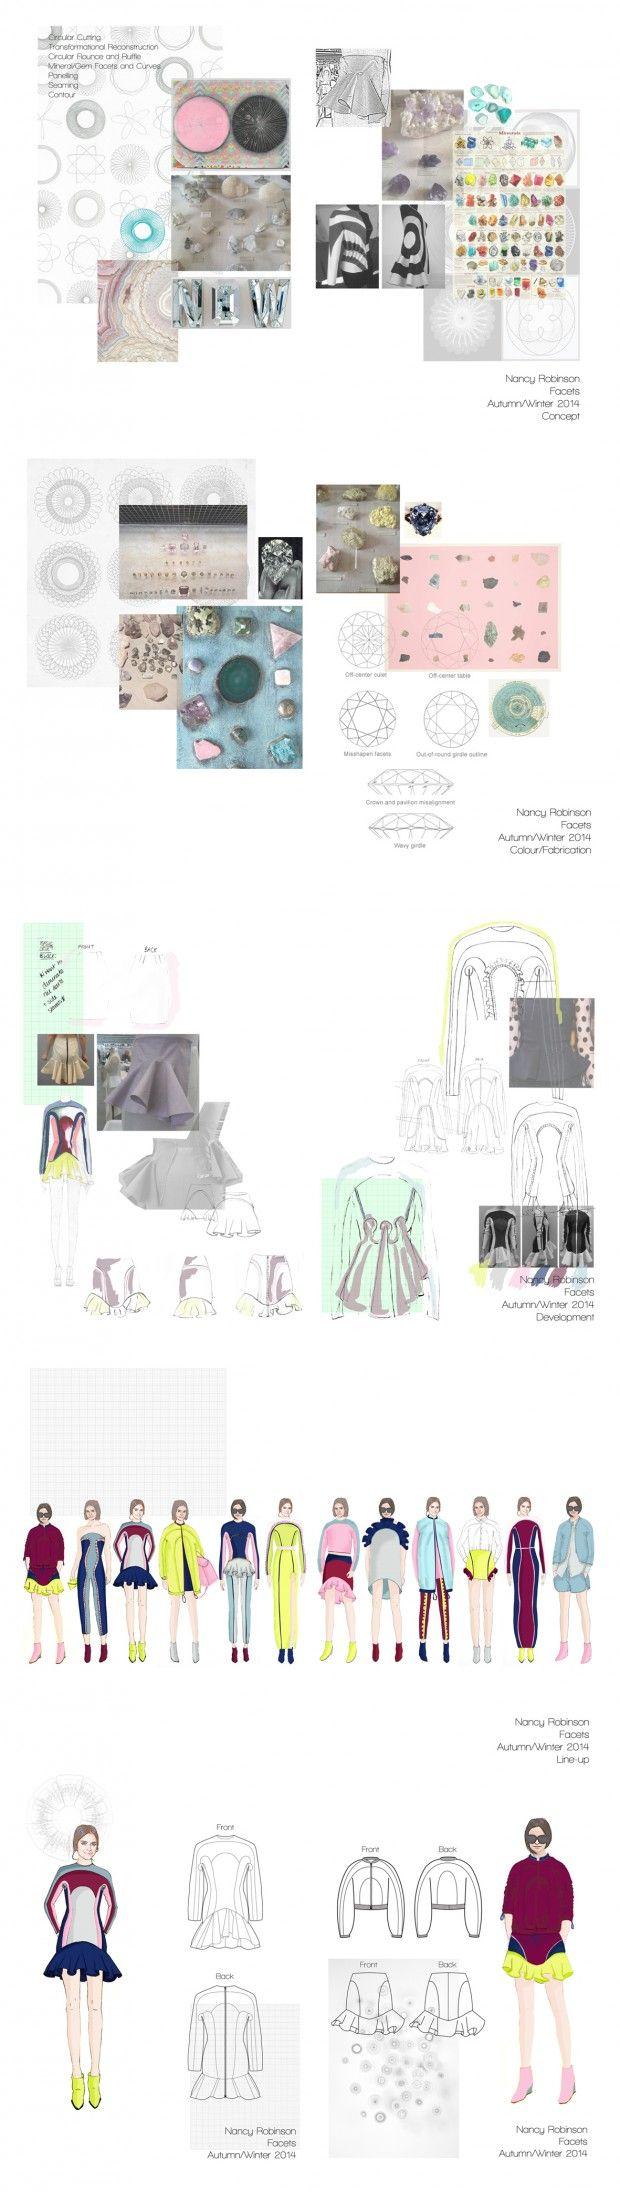 best images about fashion illustration on pinterest